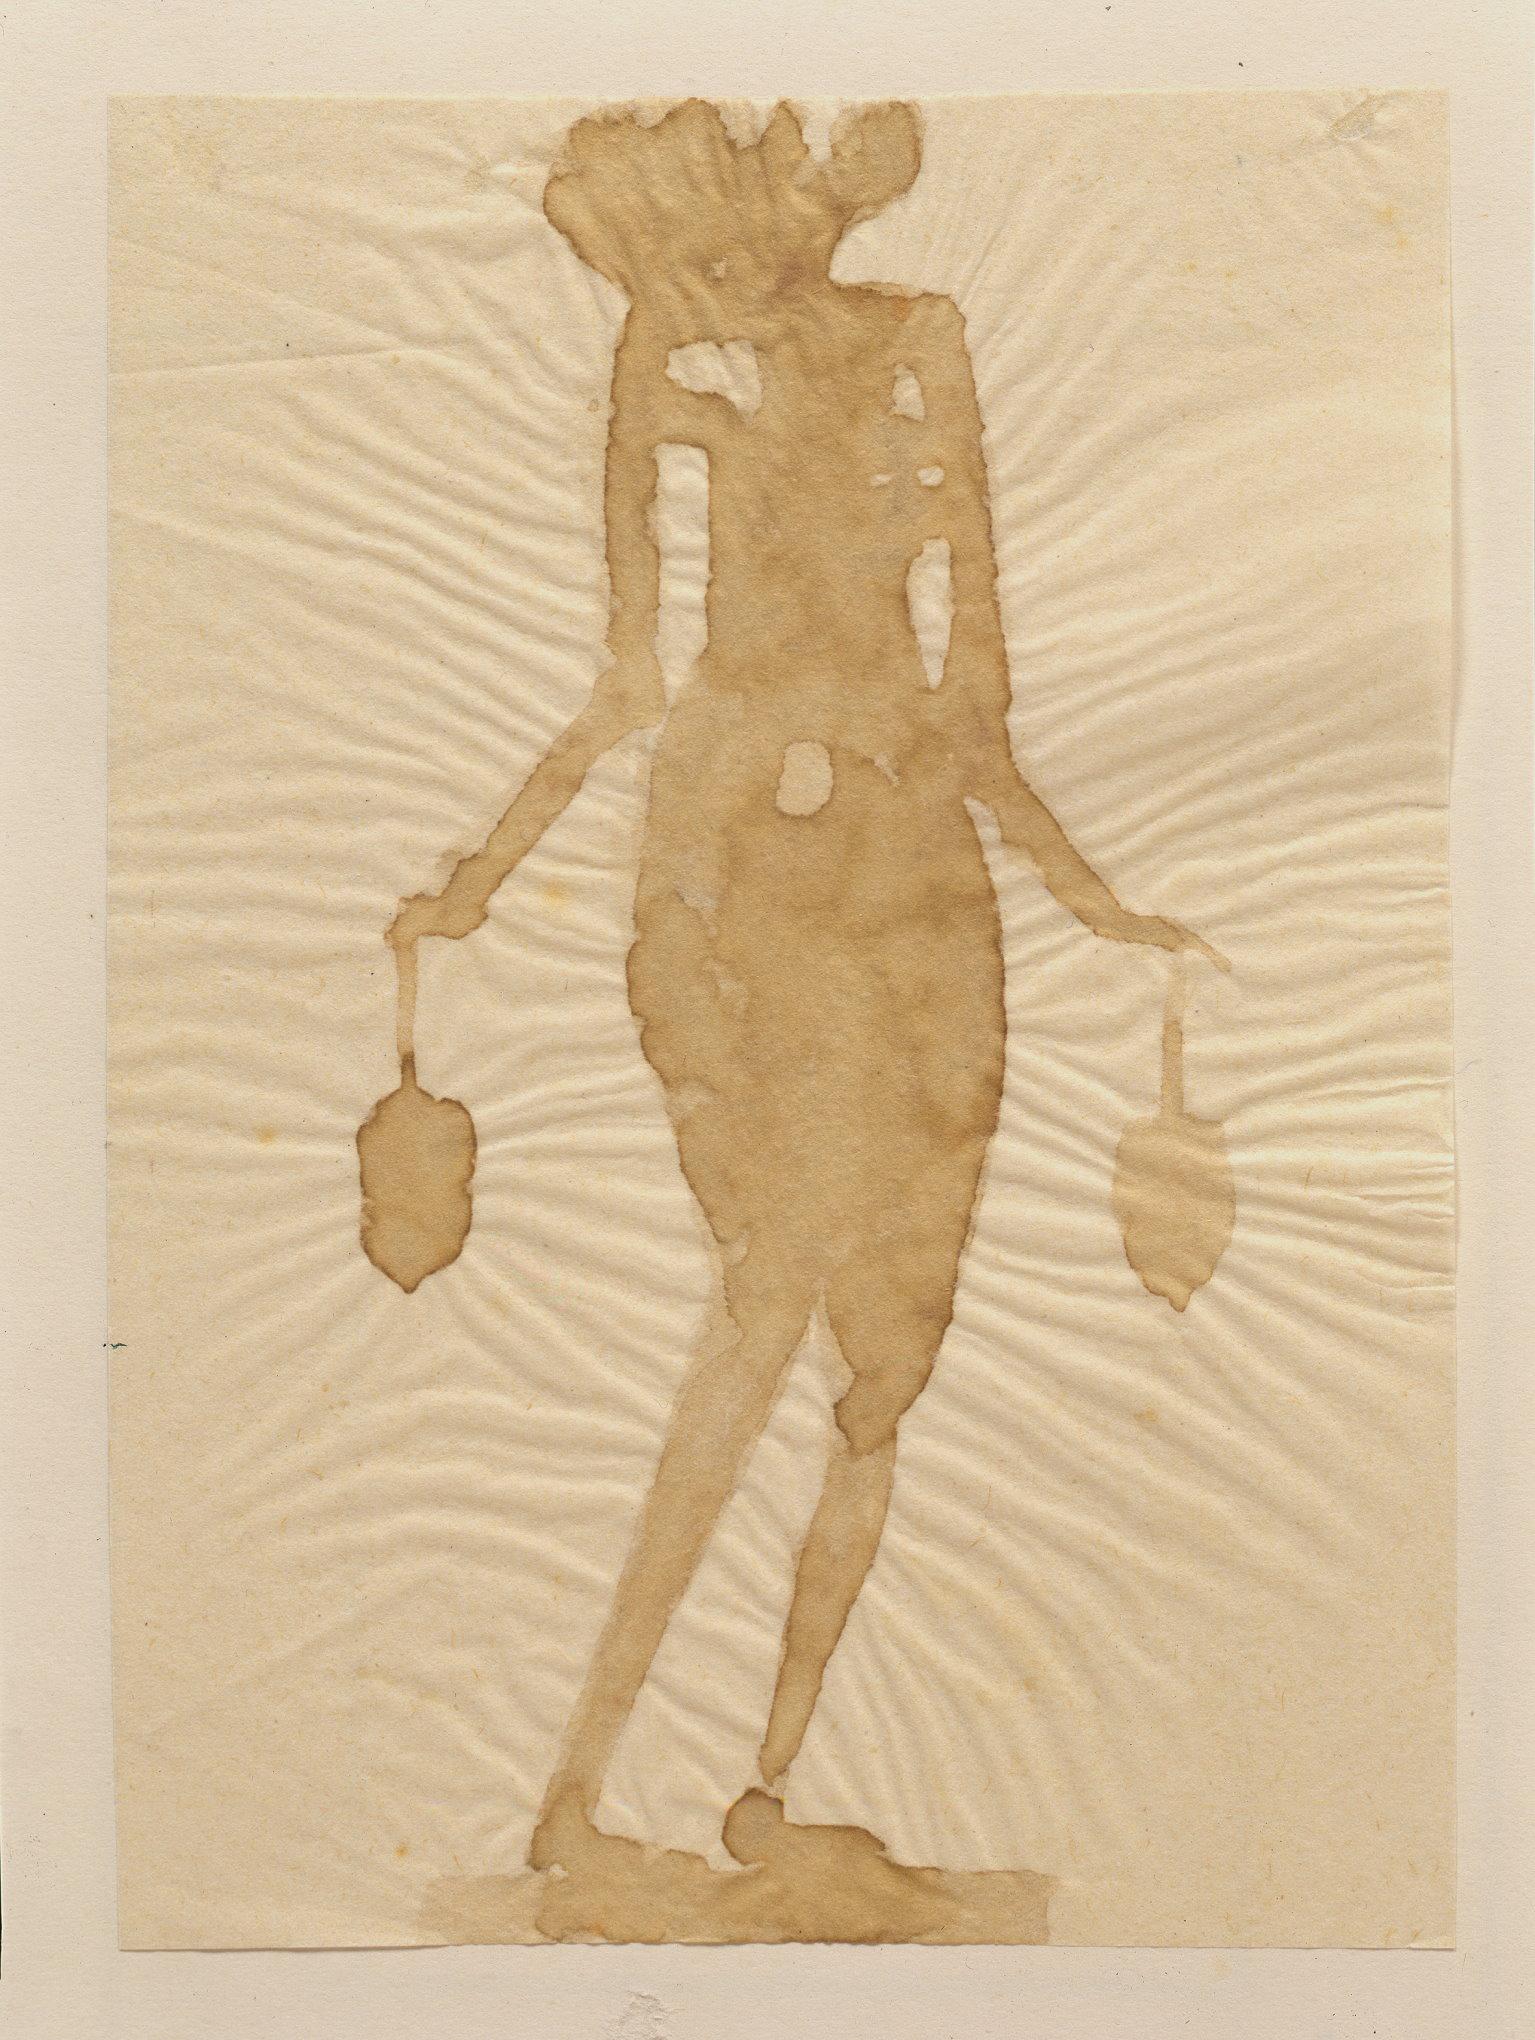 Joseph Beuys, Flower Nymph, 1956